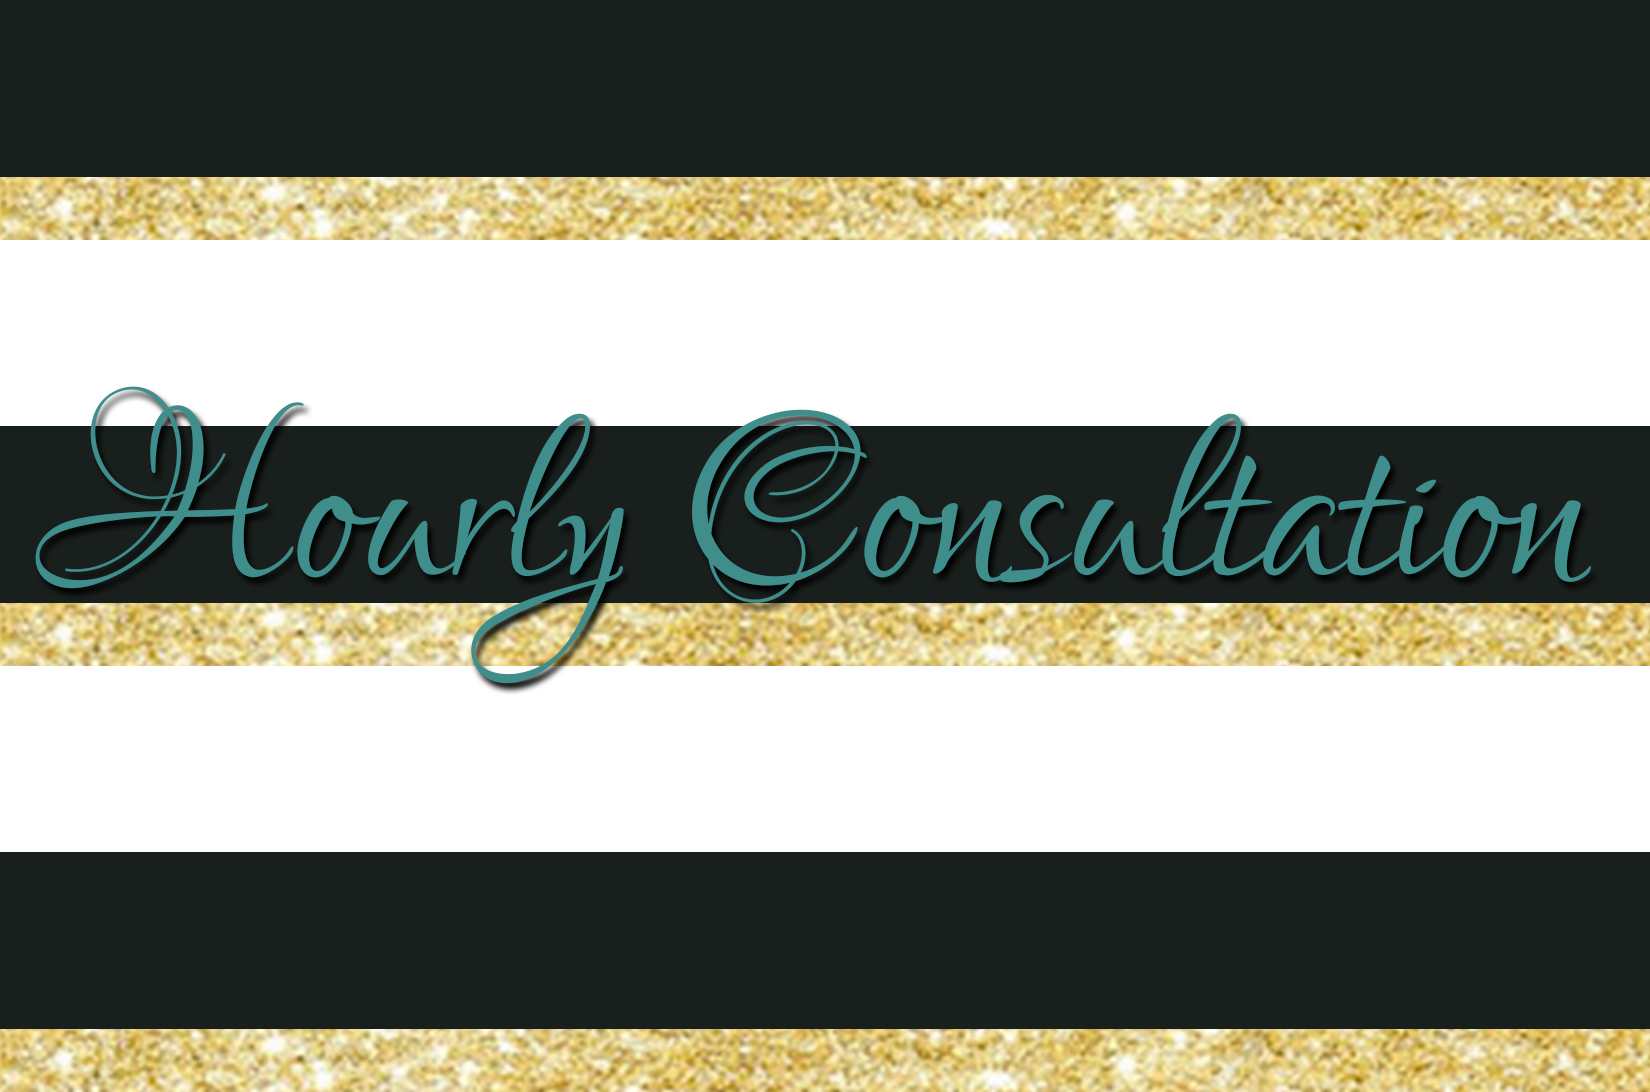 Hourly-Consultation-Amelias-Decorating-and-Design-Interior-Designer-New-Jersey-Pay-as-you-go.jpg